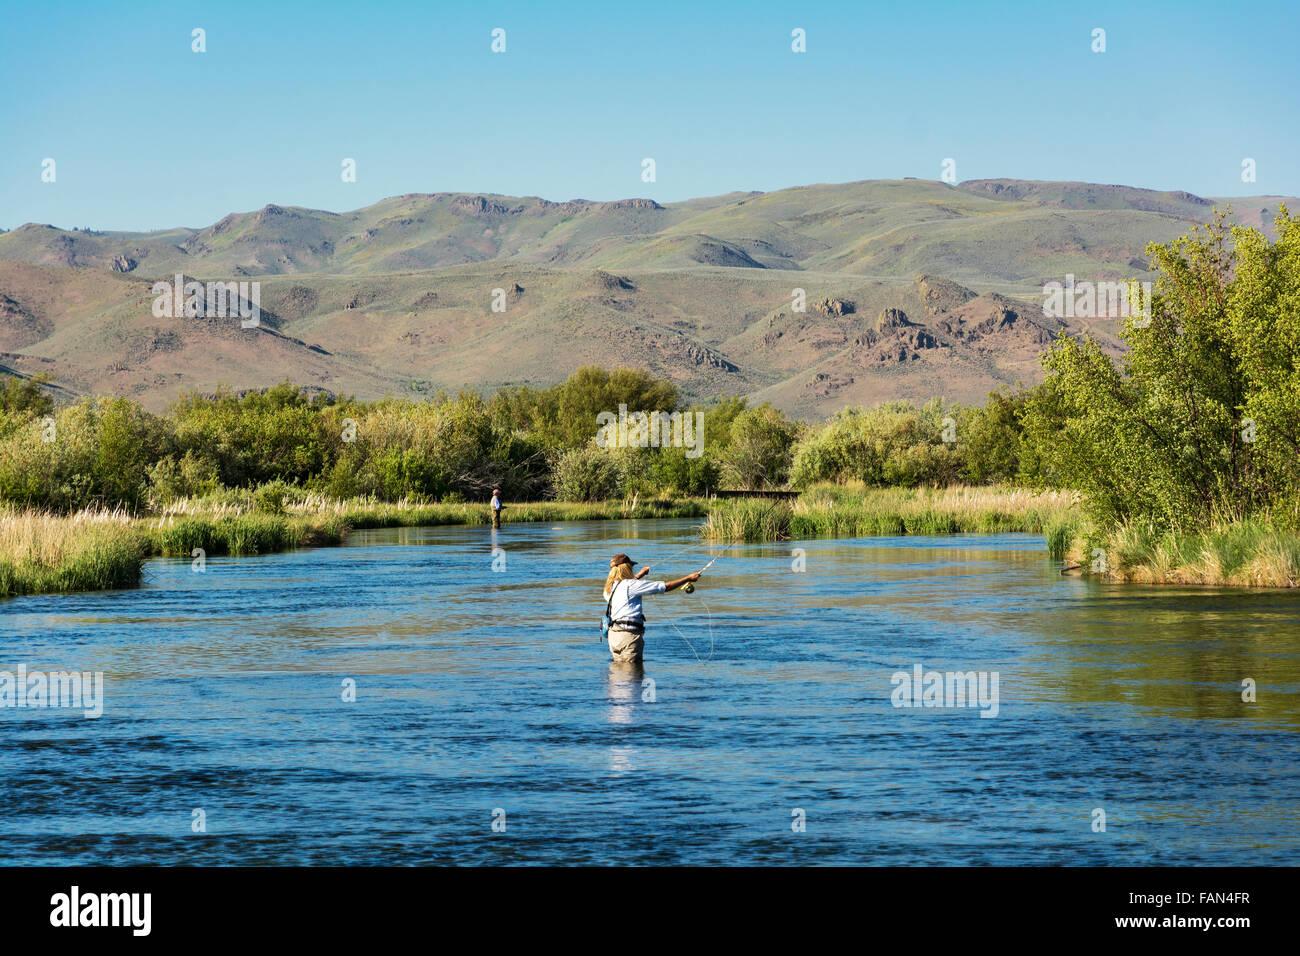 Idaho, Bellevue, Silver Creek Preserve, woman female fly fisherwoman trout fishing - Stock Image